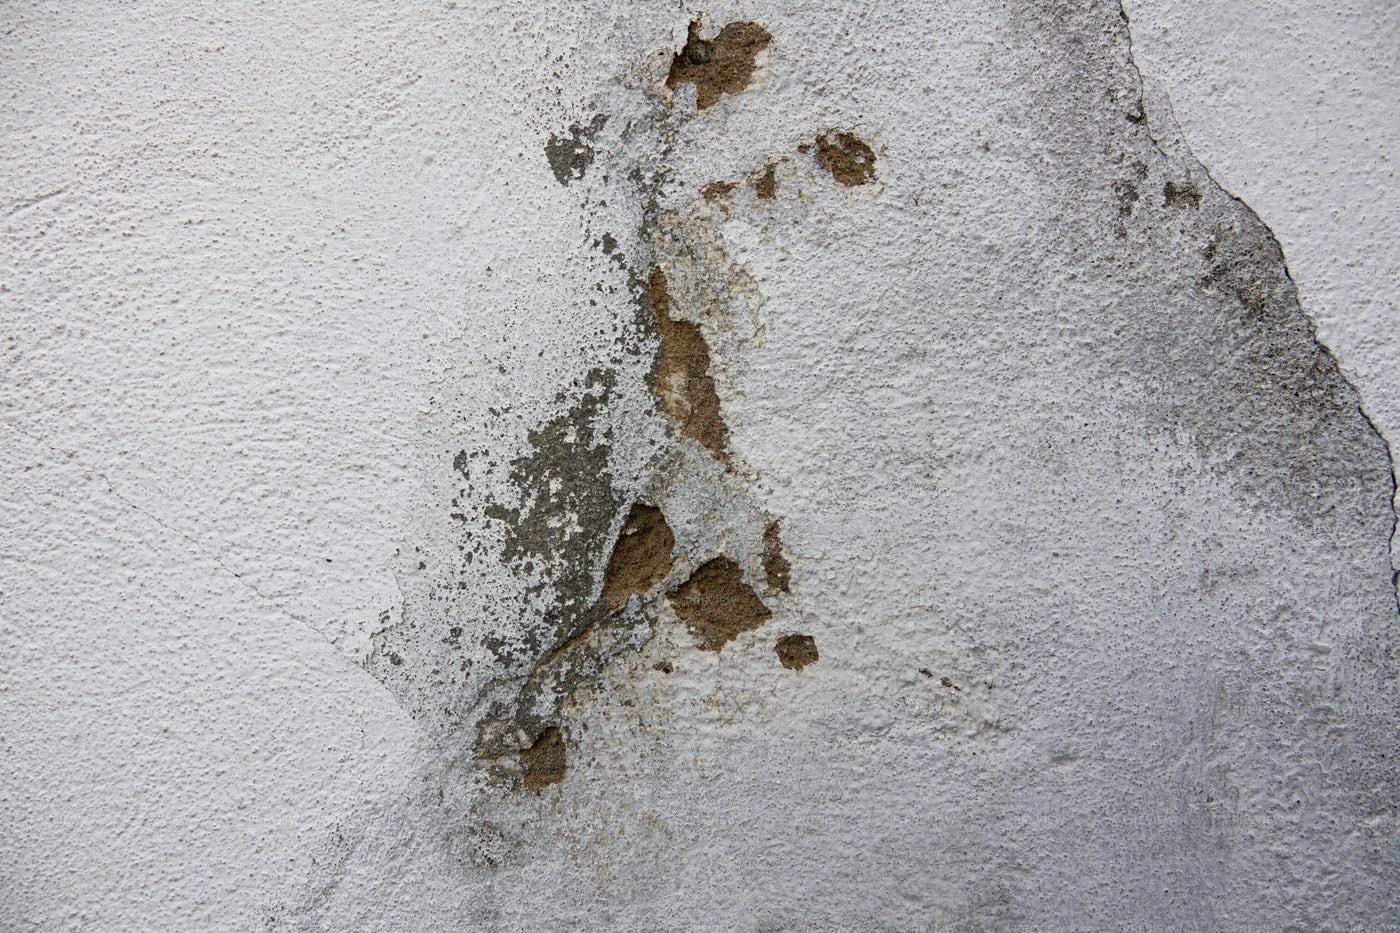 Texture A Worn Wall: Stock Photos